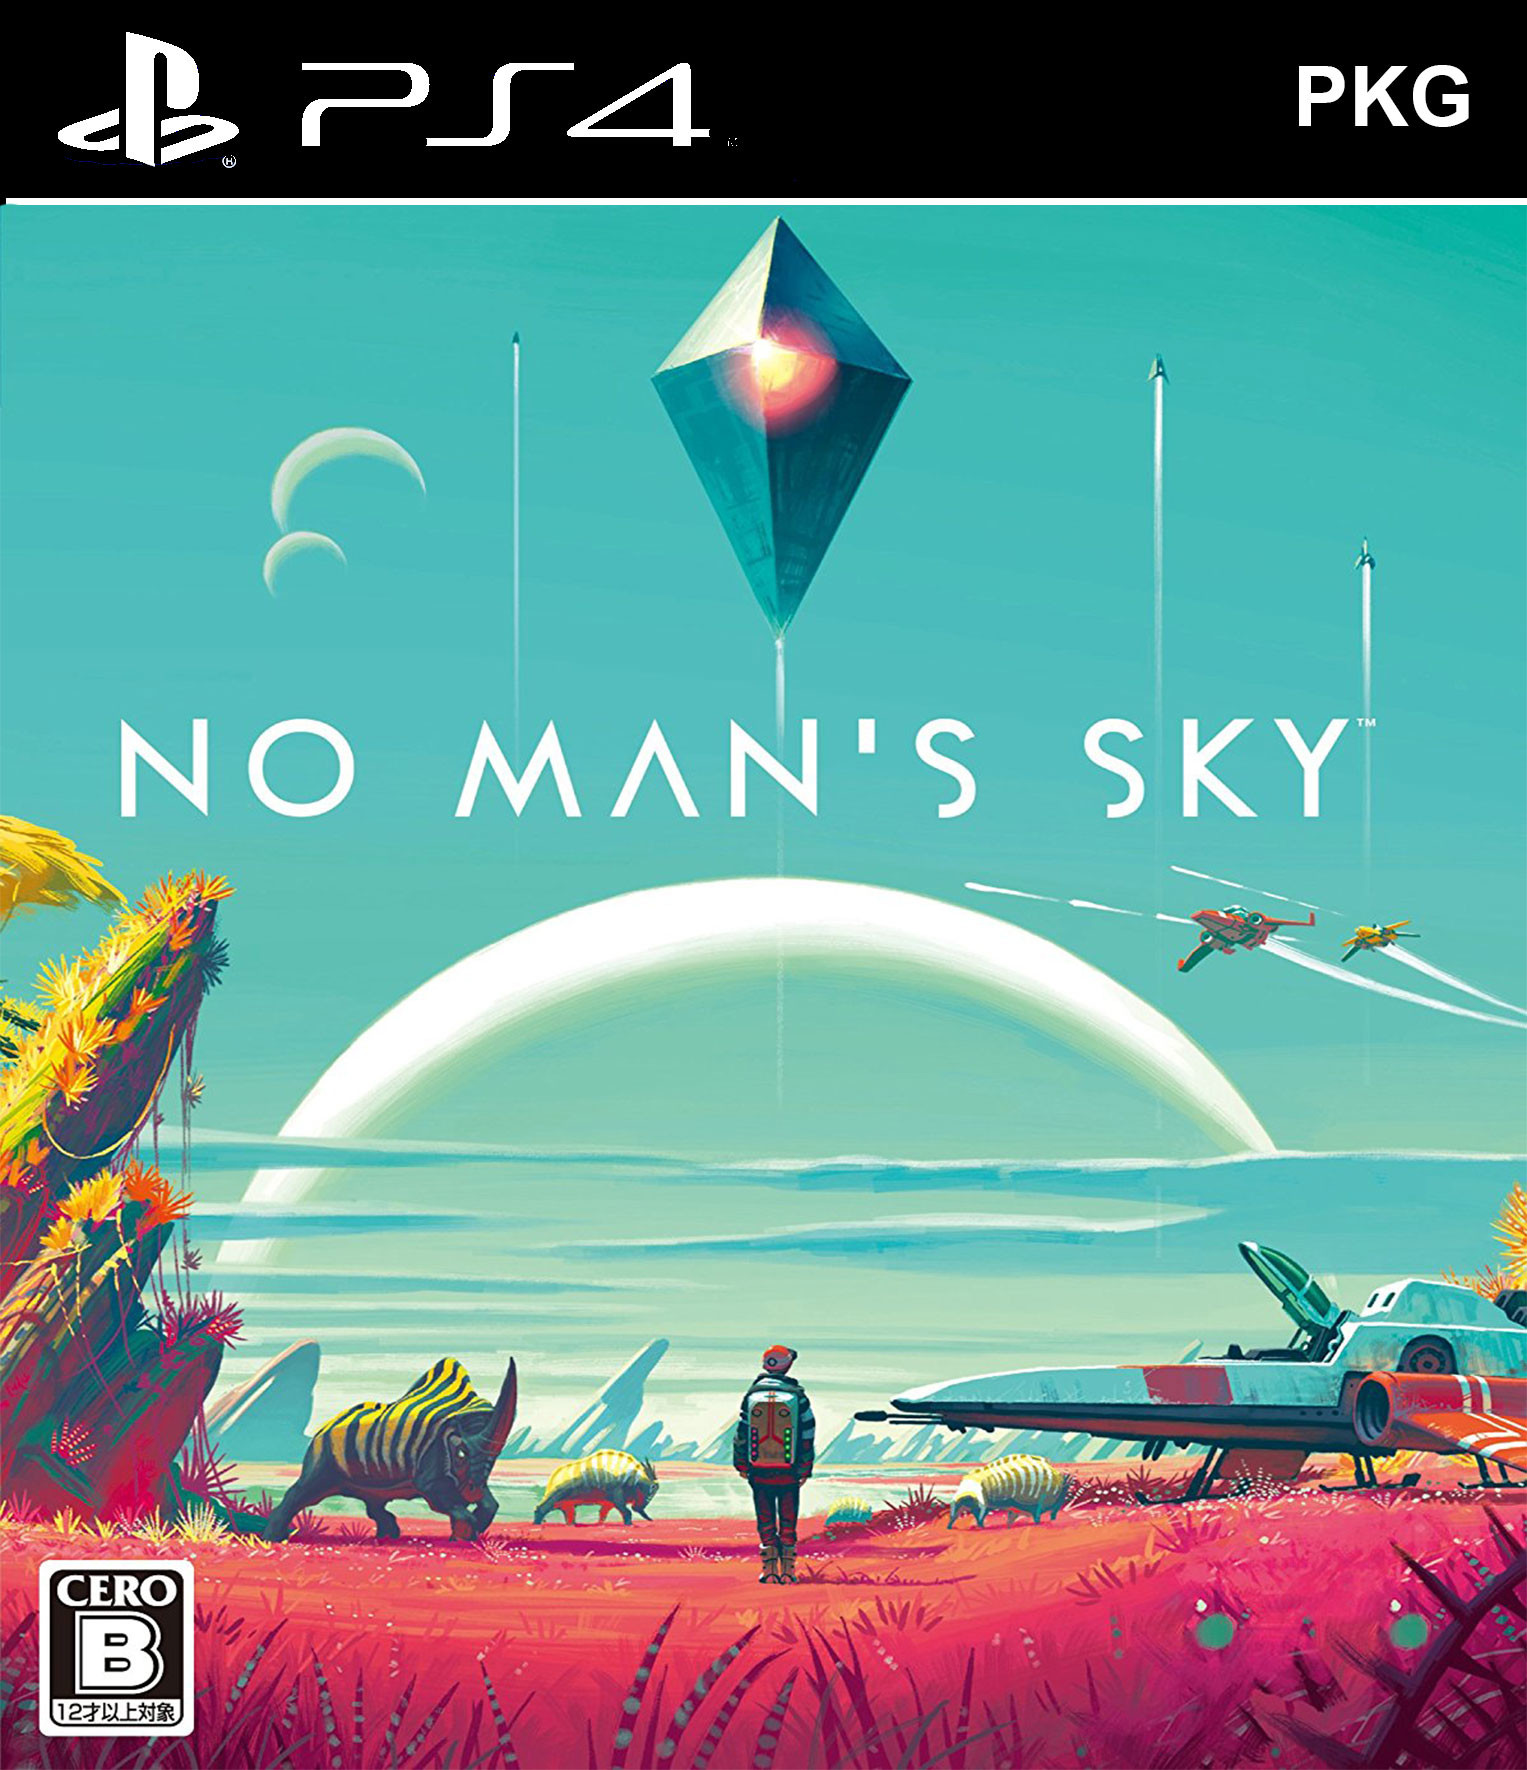 No Man's Sky PKG Oyun İndir ! [4.05